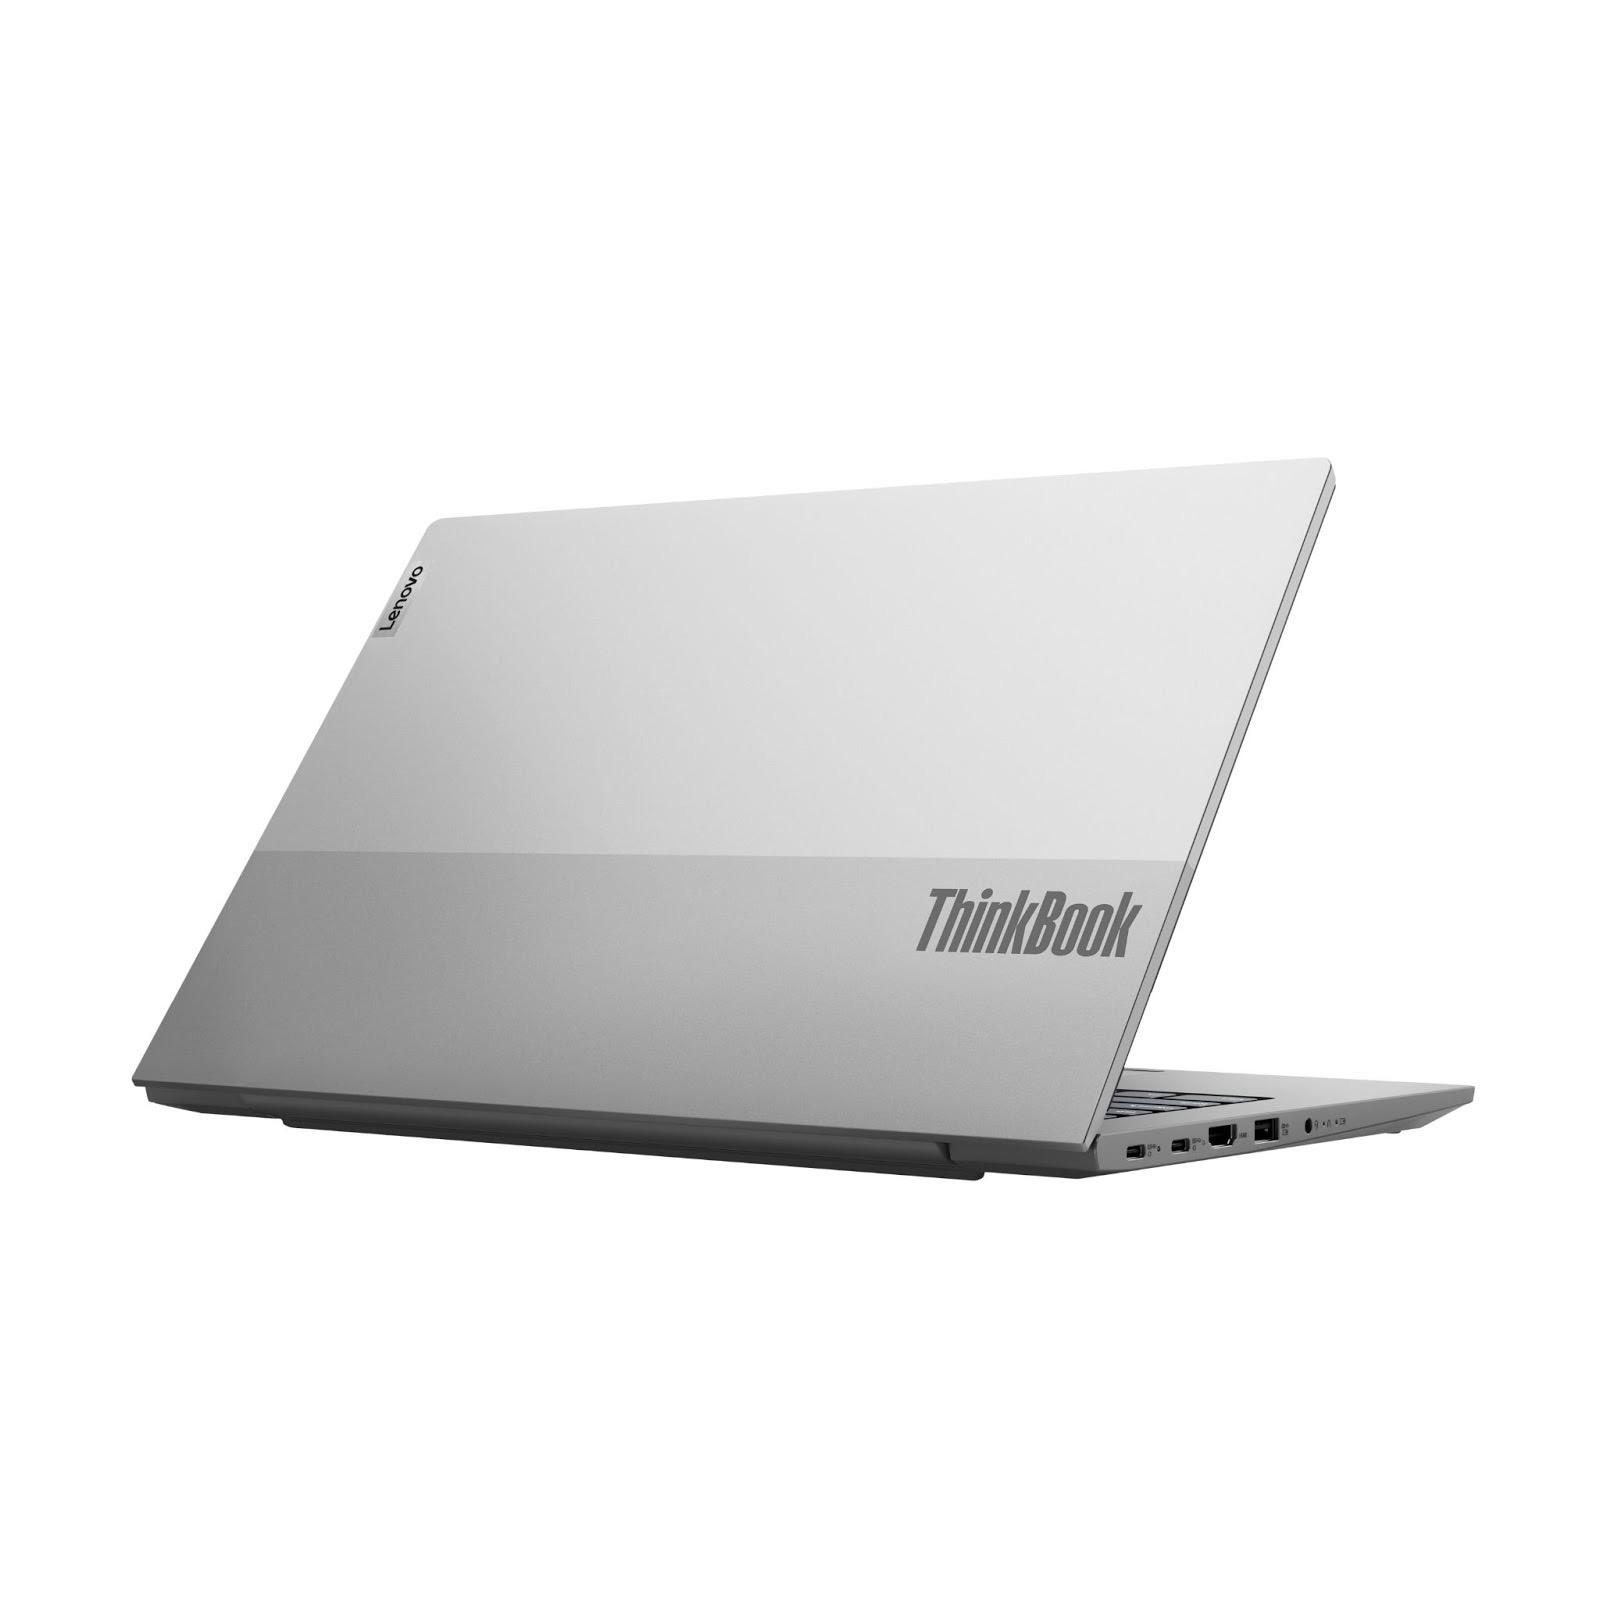 Фото 2. Ноутбук Lenovo ThinkBook 14 Gen 2 ITL Mineral Grey (20VD00CNRU)